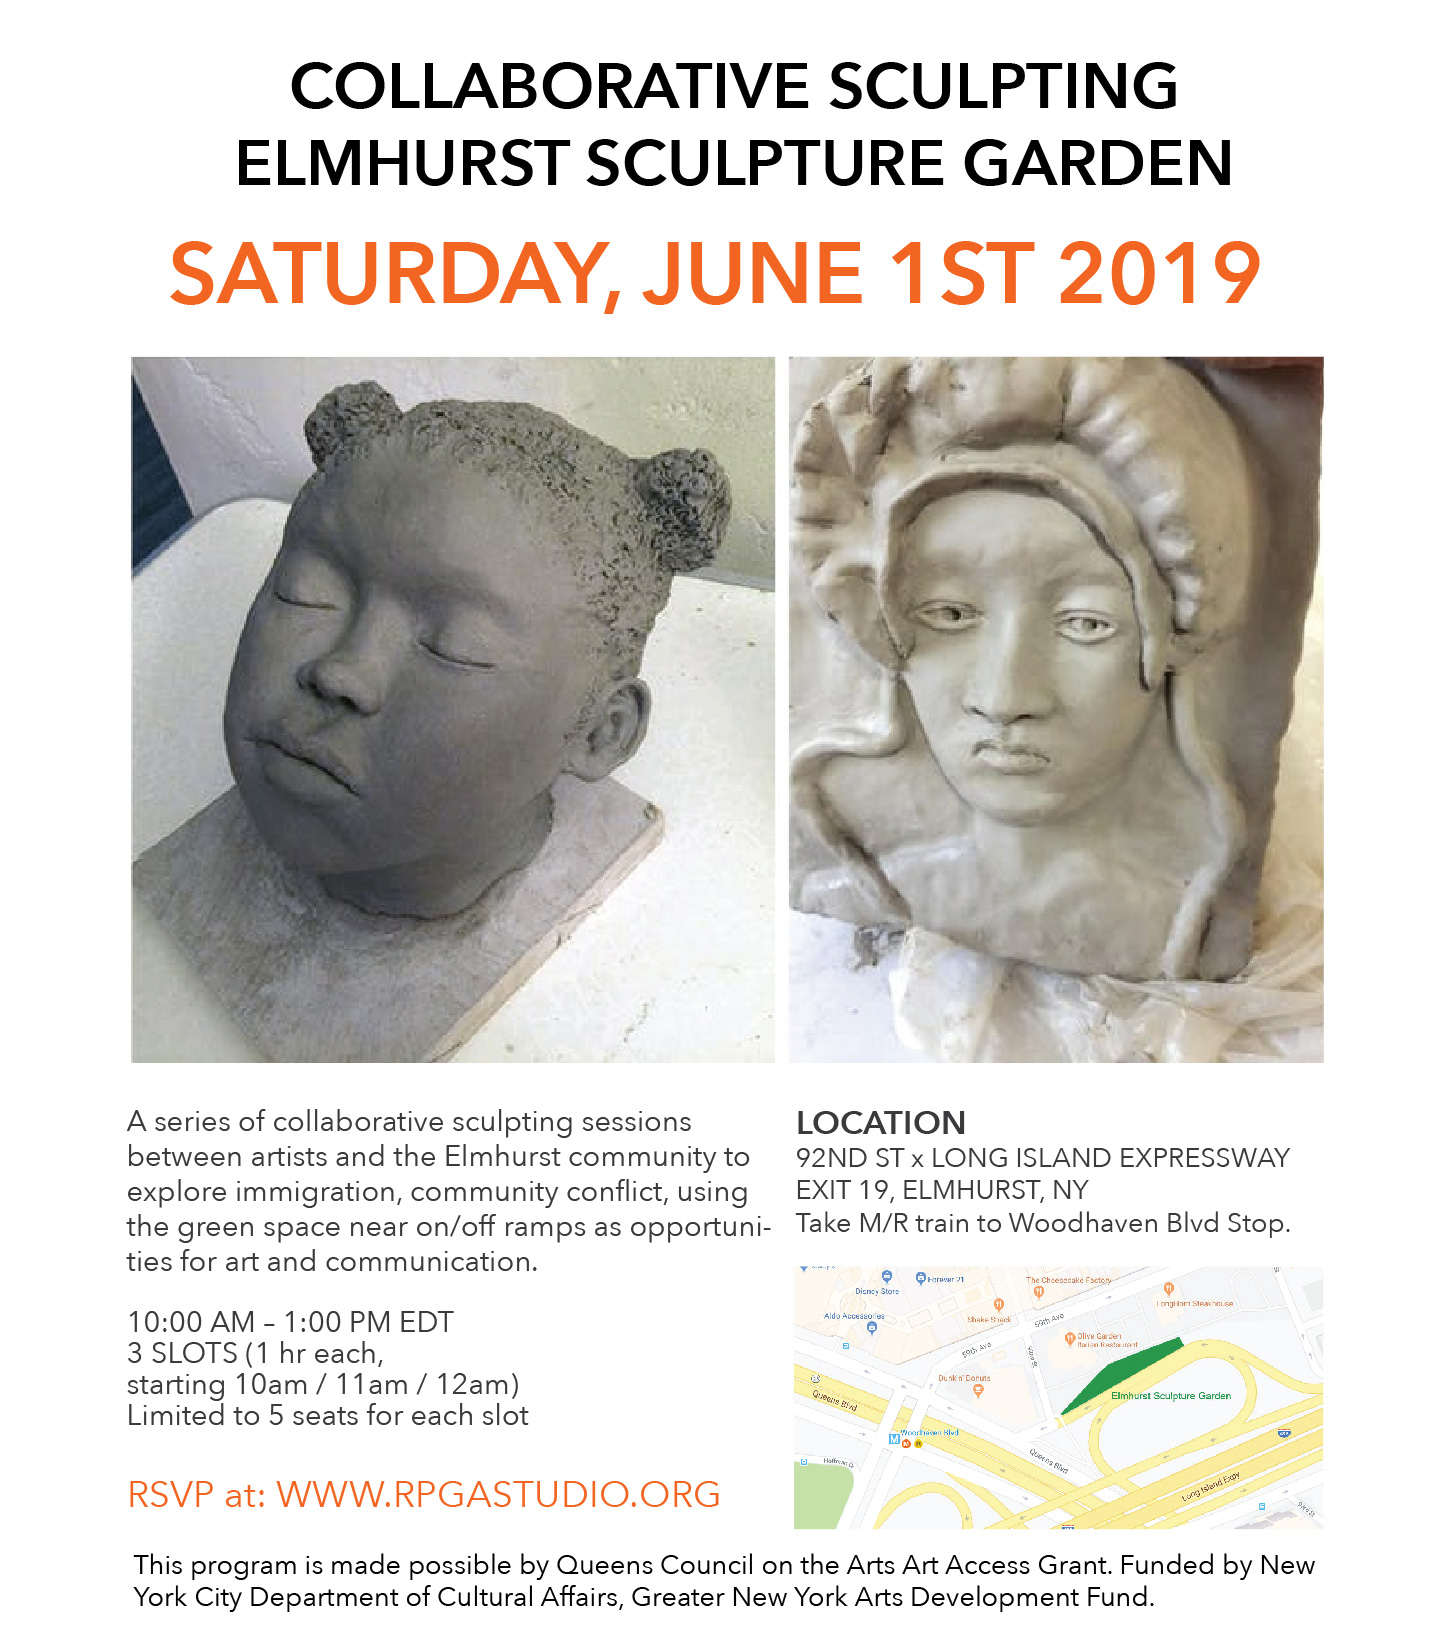 elm_collab_sculpting_flyer.jpg